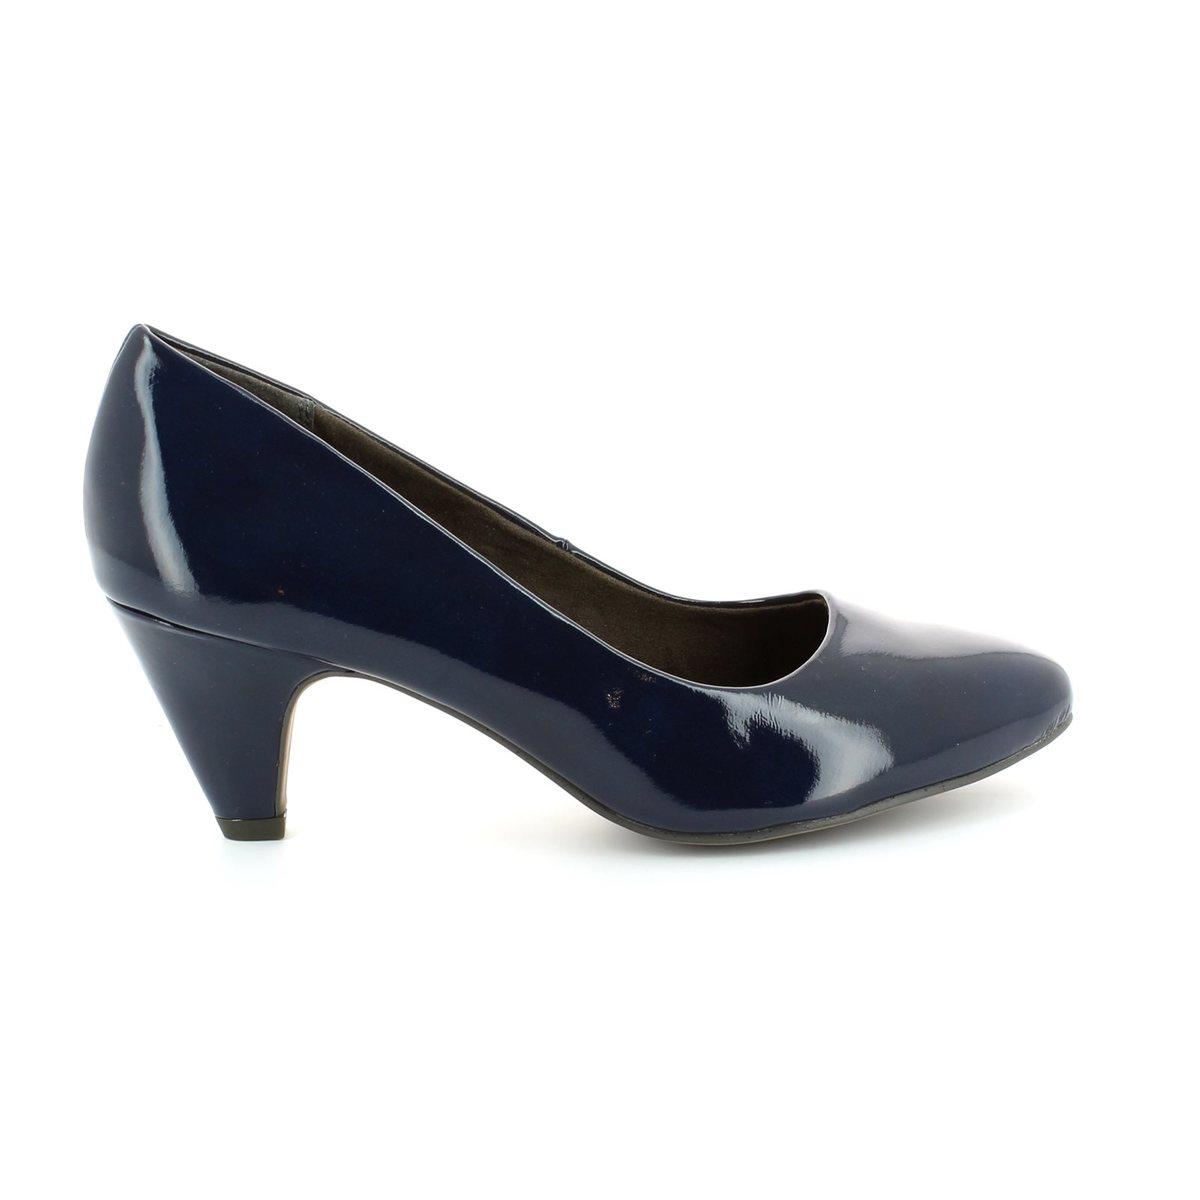 tamaris cressco 22416 826 navy patent high heeled shoes. Black Bedroom Furniture Sets. Home Design Ideas